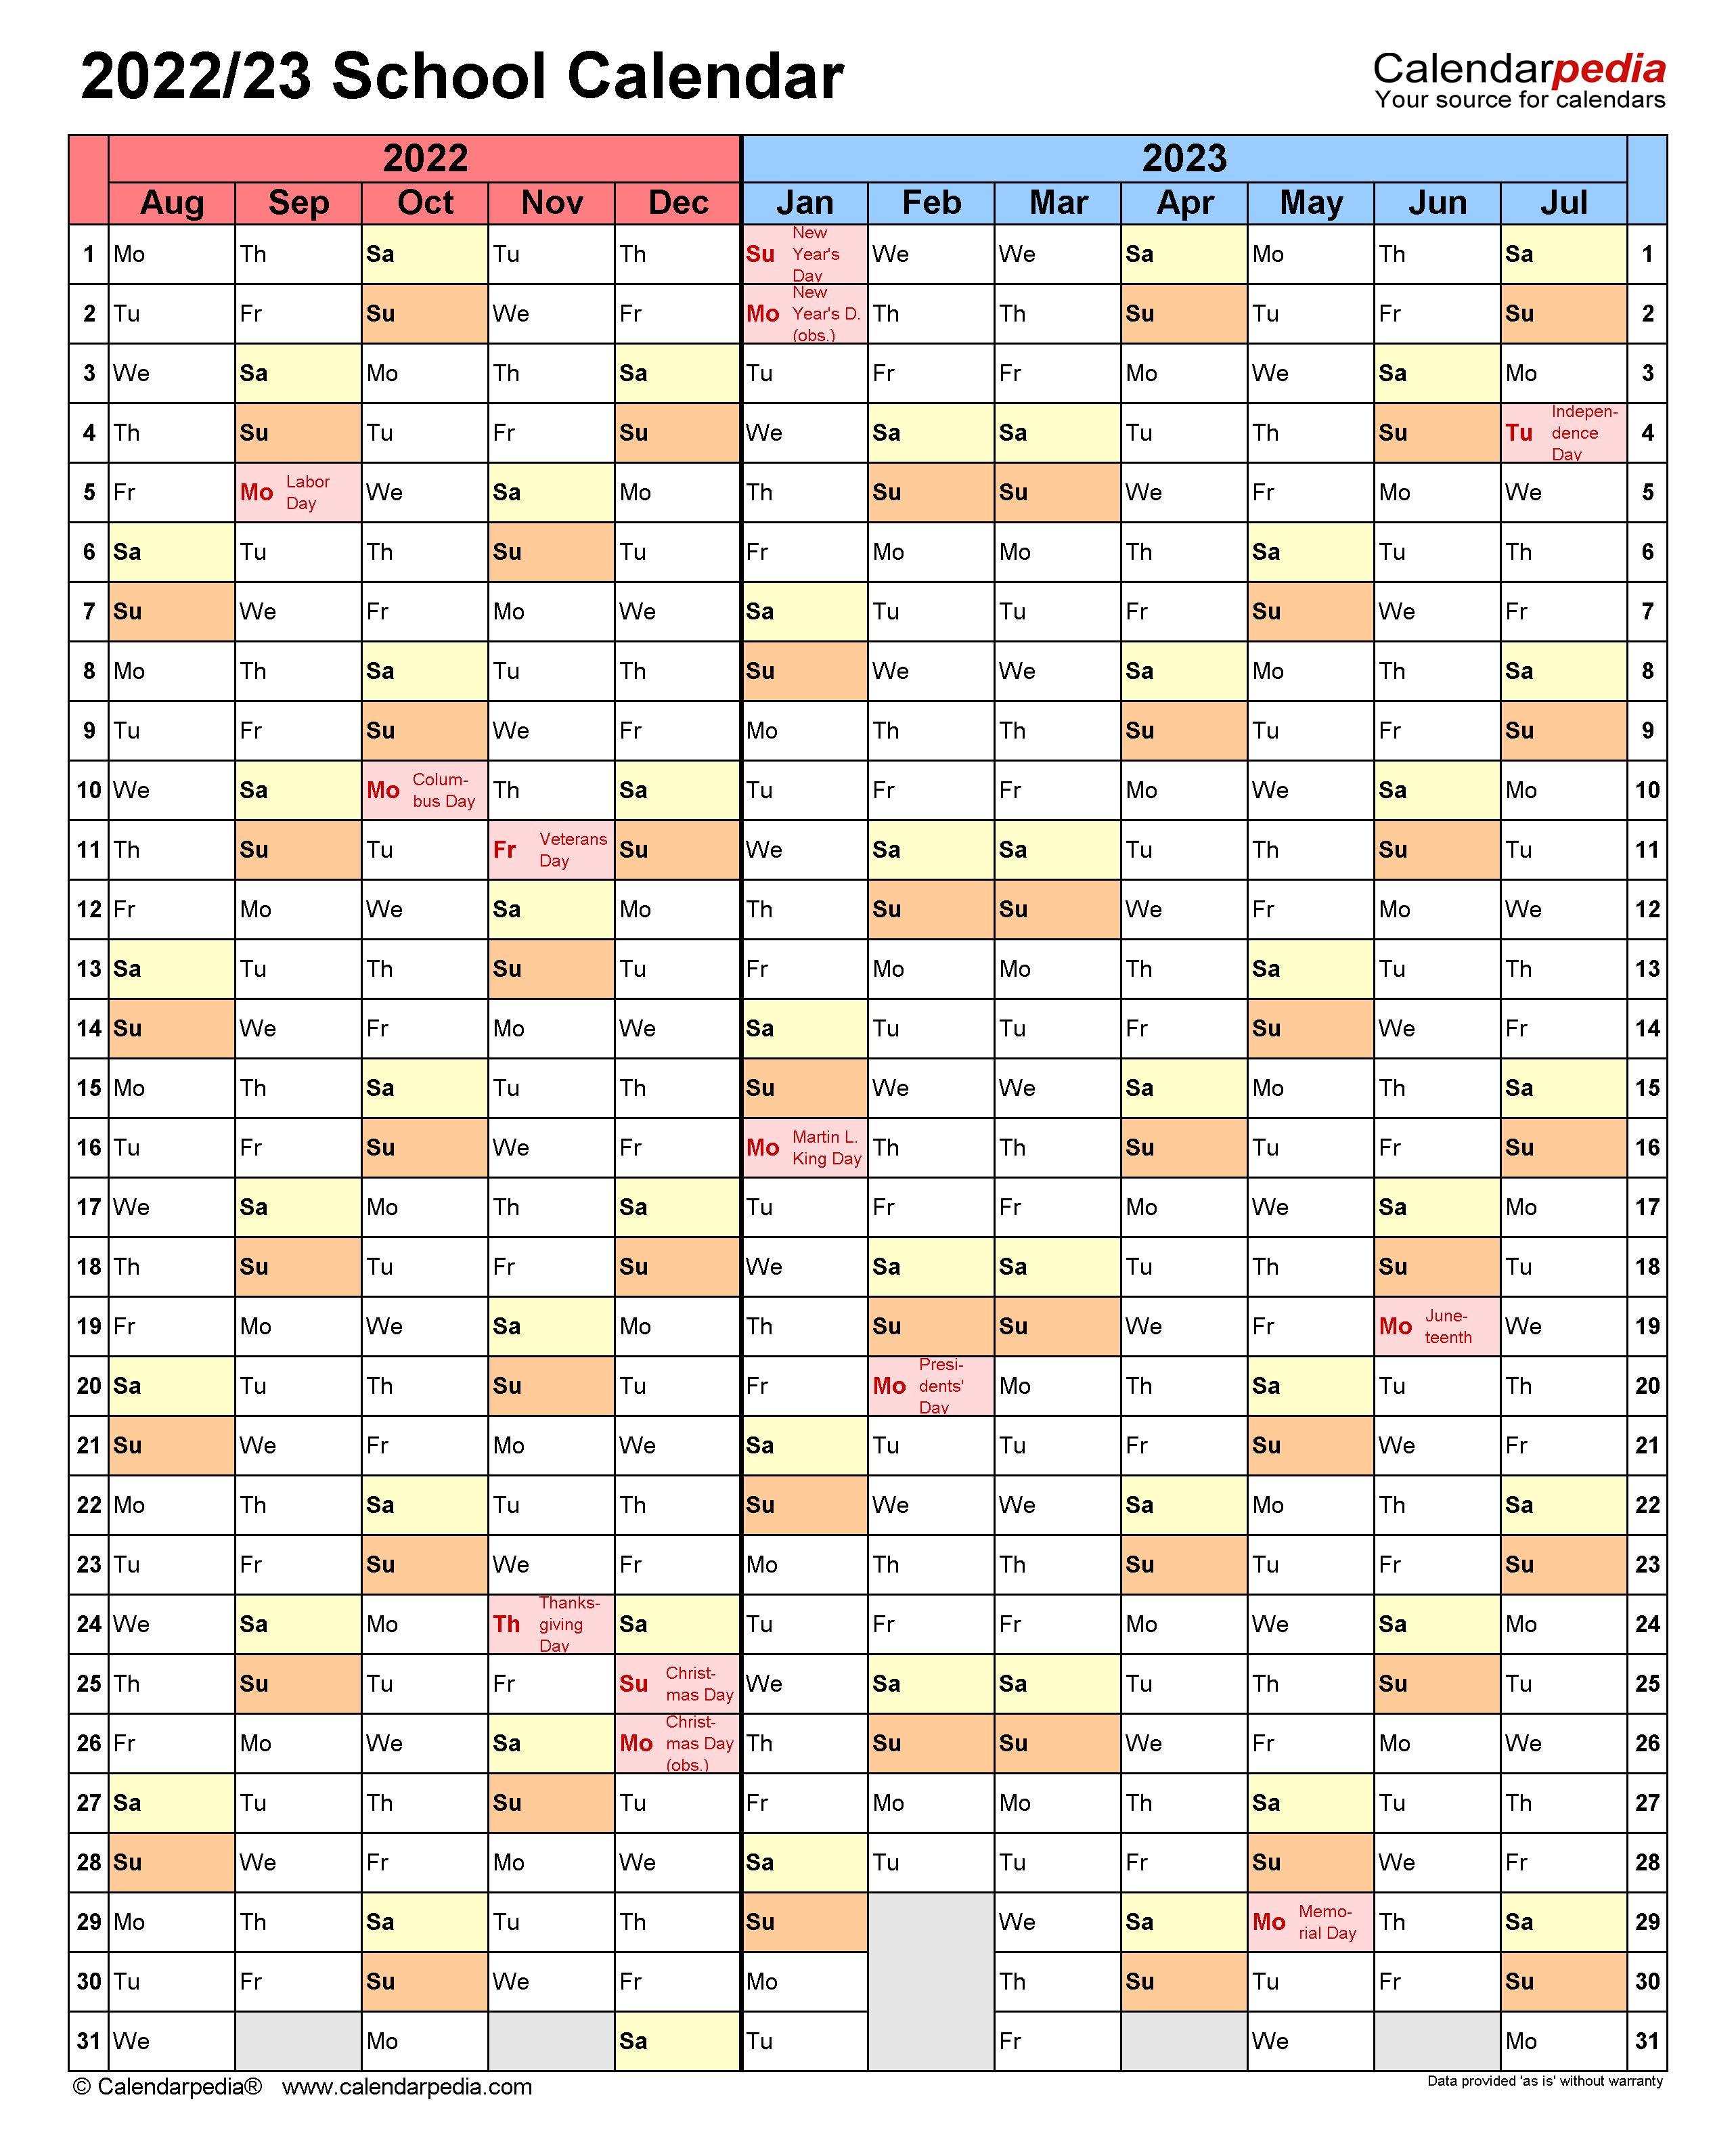 Cusd Calendar 2022 23.School Calendars 2022 2023 Free Printable Word Templates